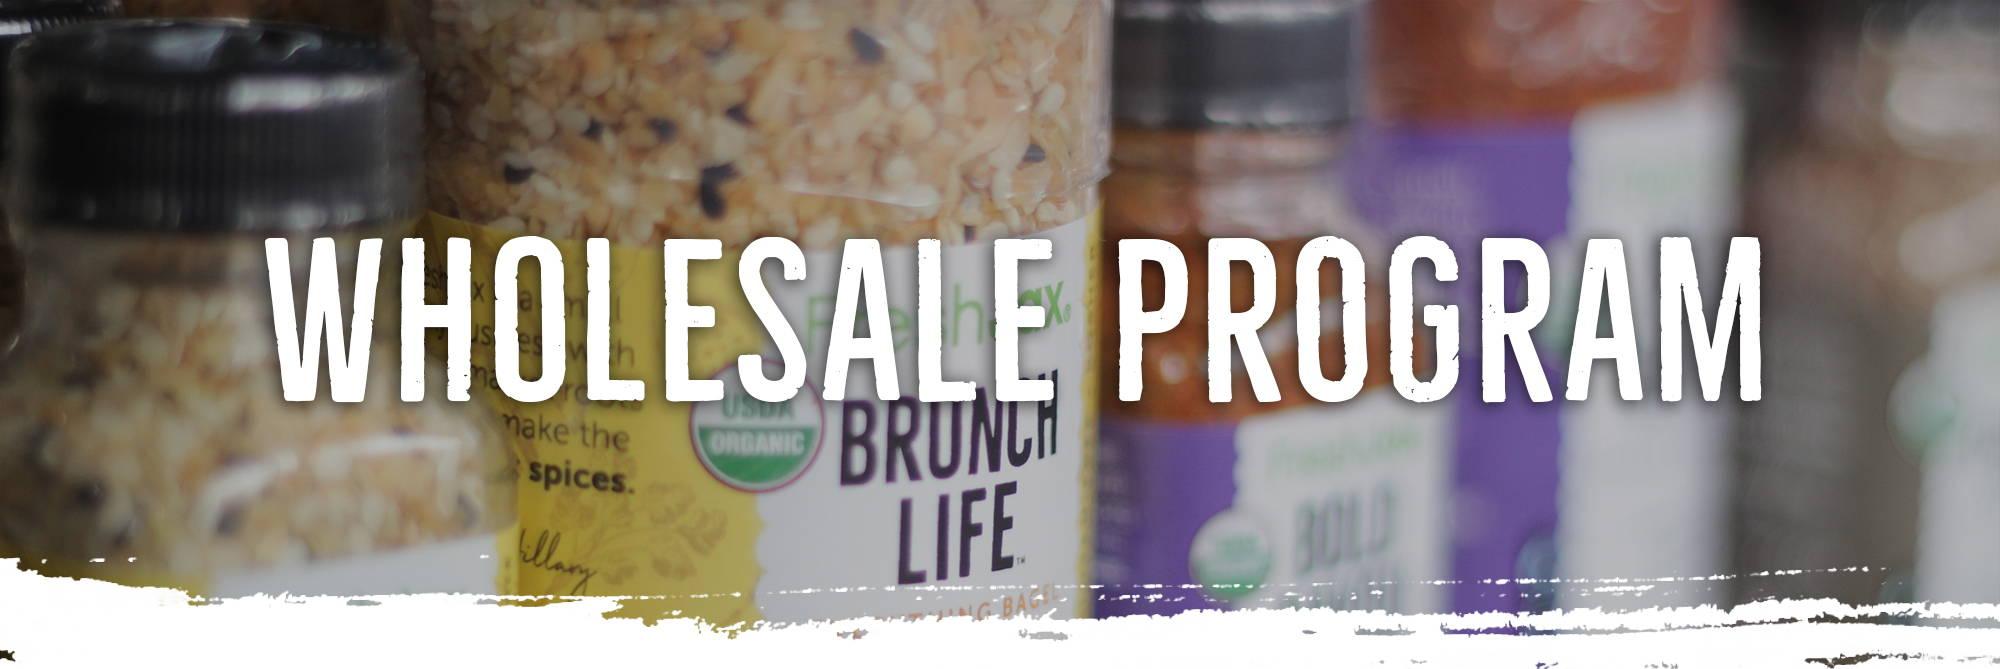 Wholesale Program